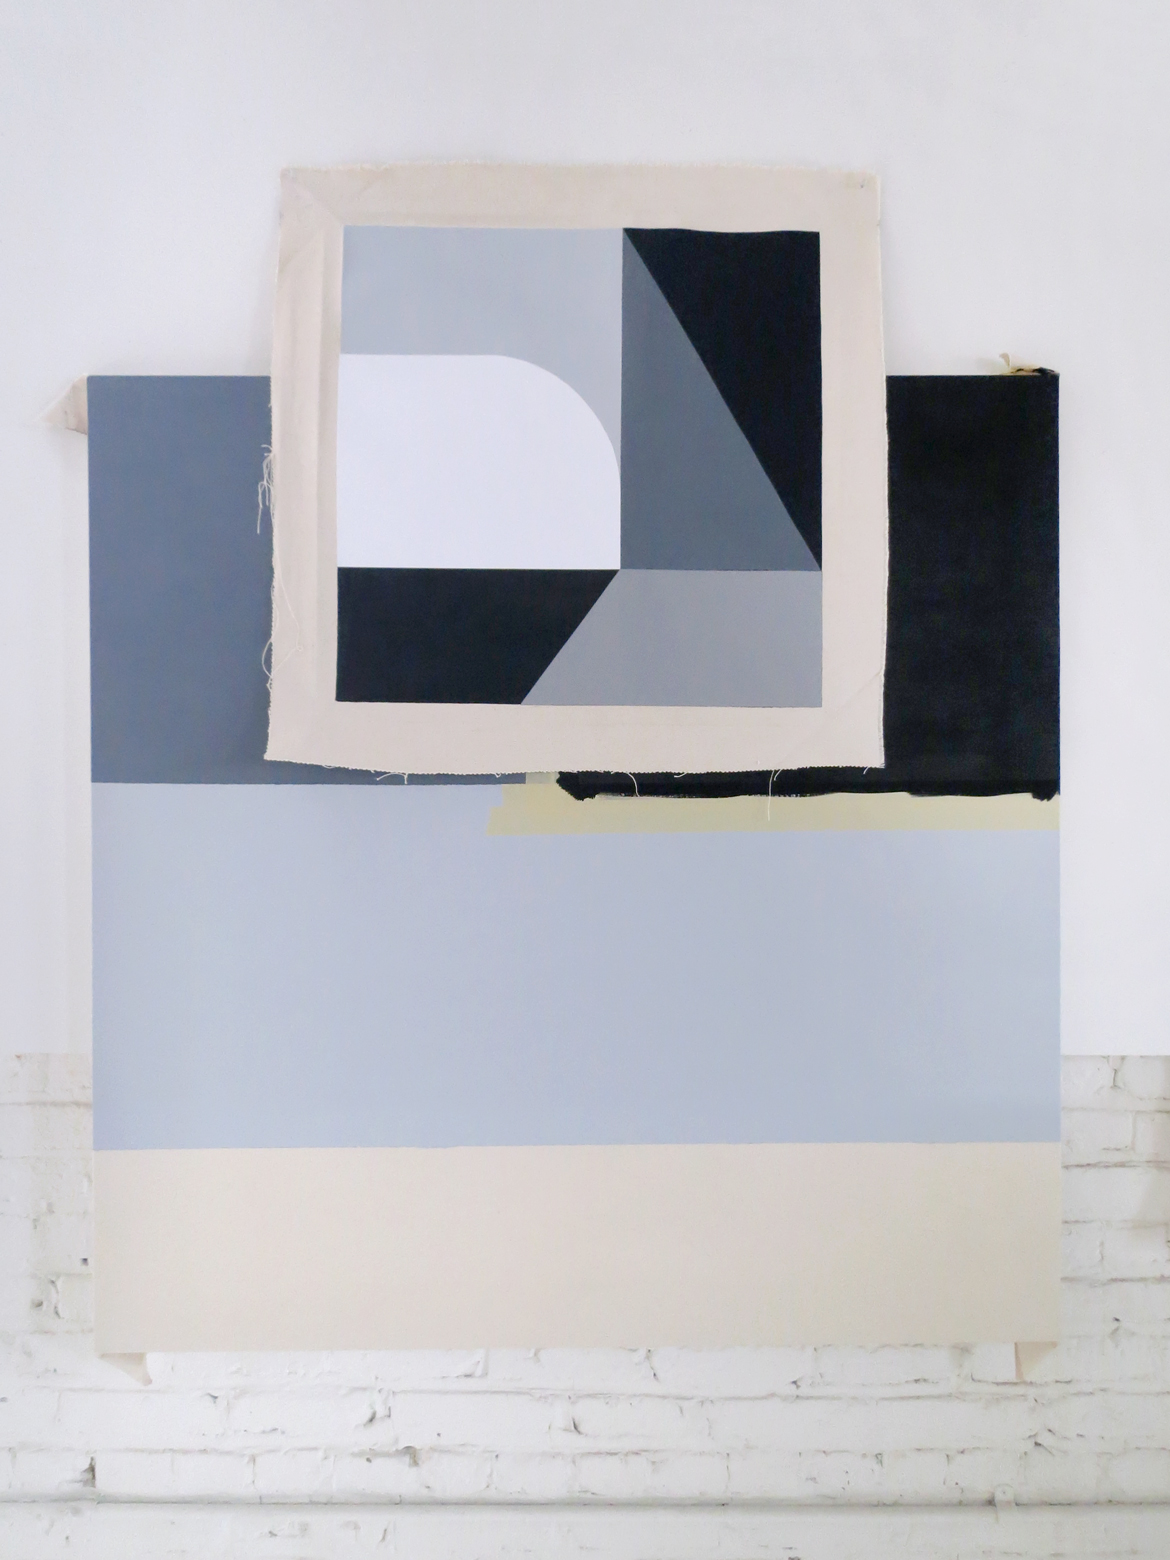 chadkouri-aslidingscalefromblacktowhite-uprise-offsite-process